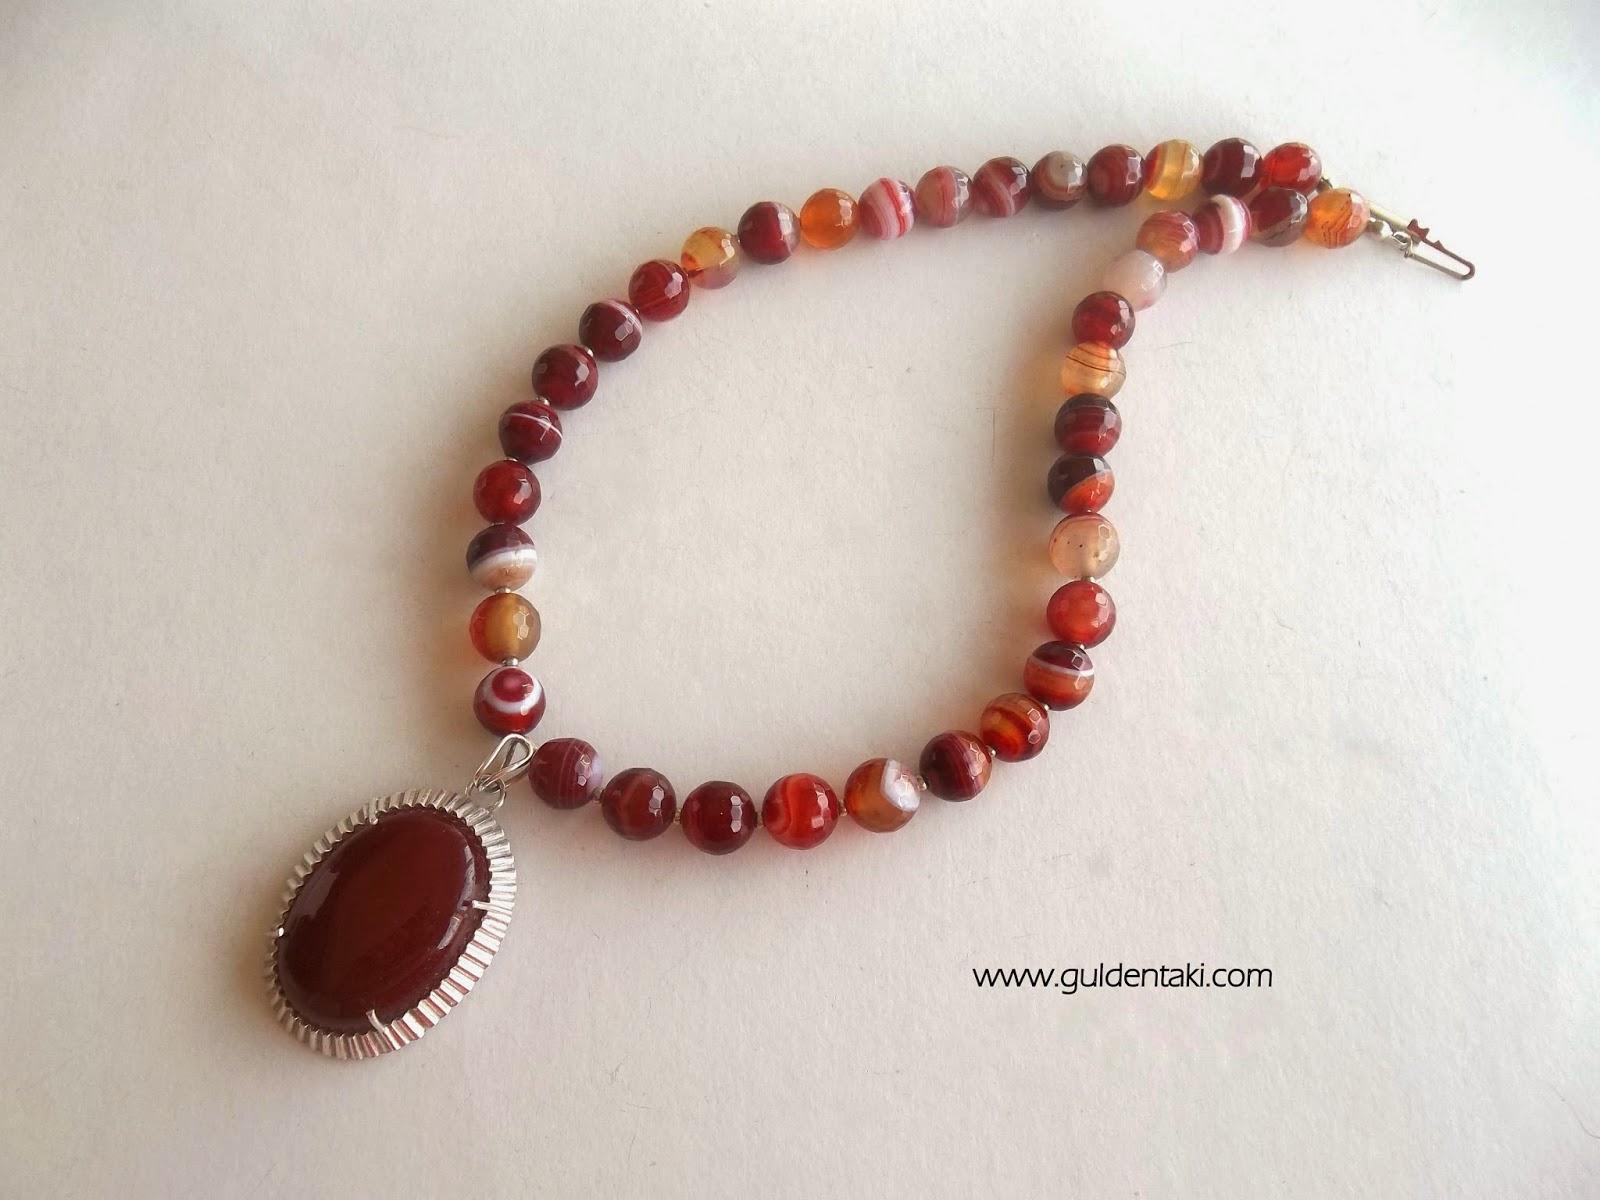 agat jewelry